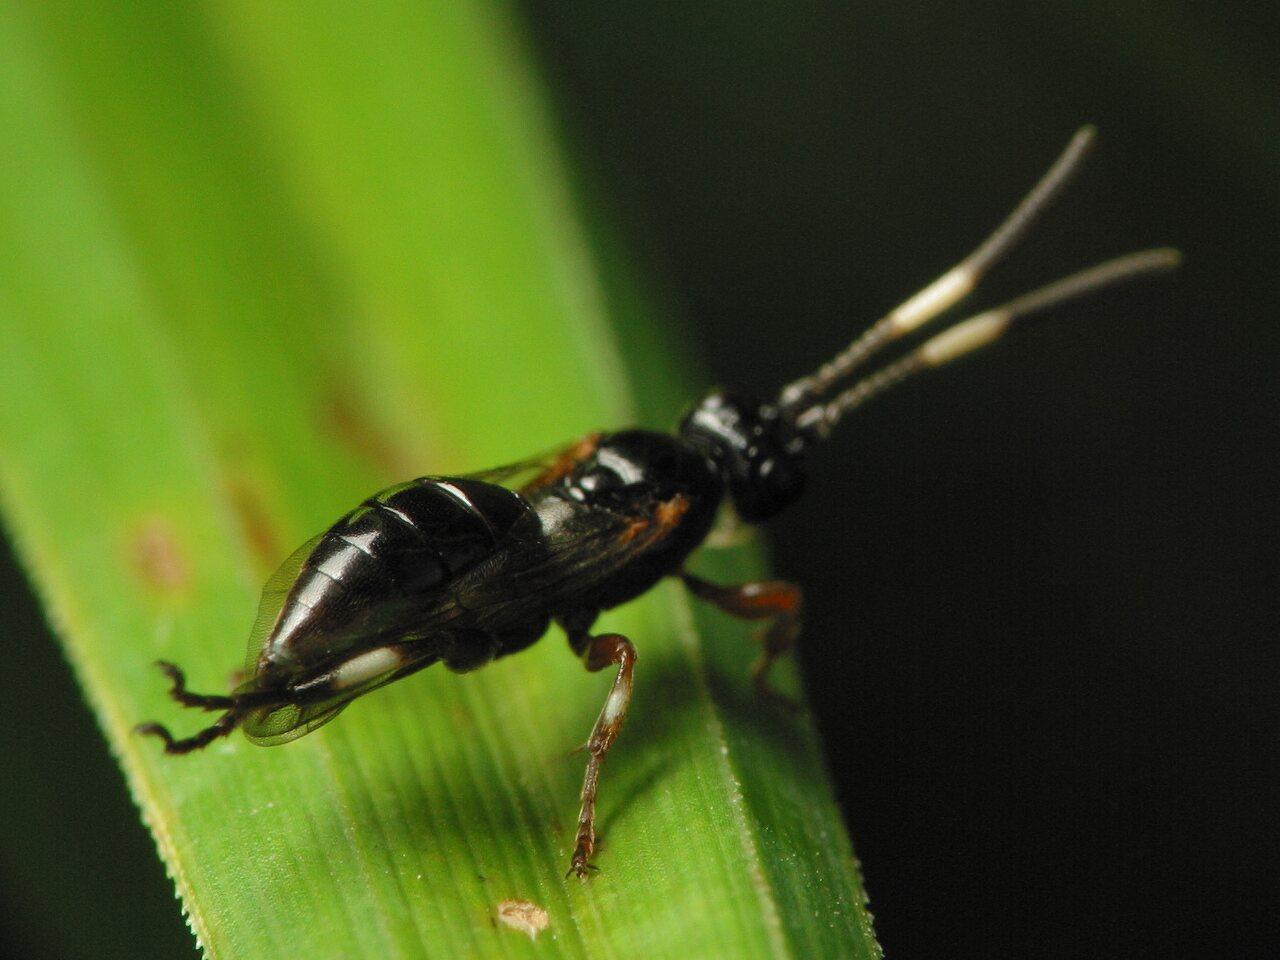 Hymenoptera-3537.jpg